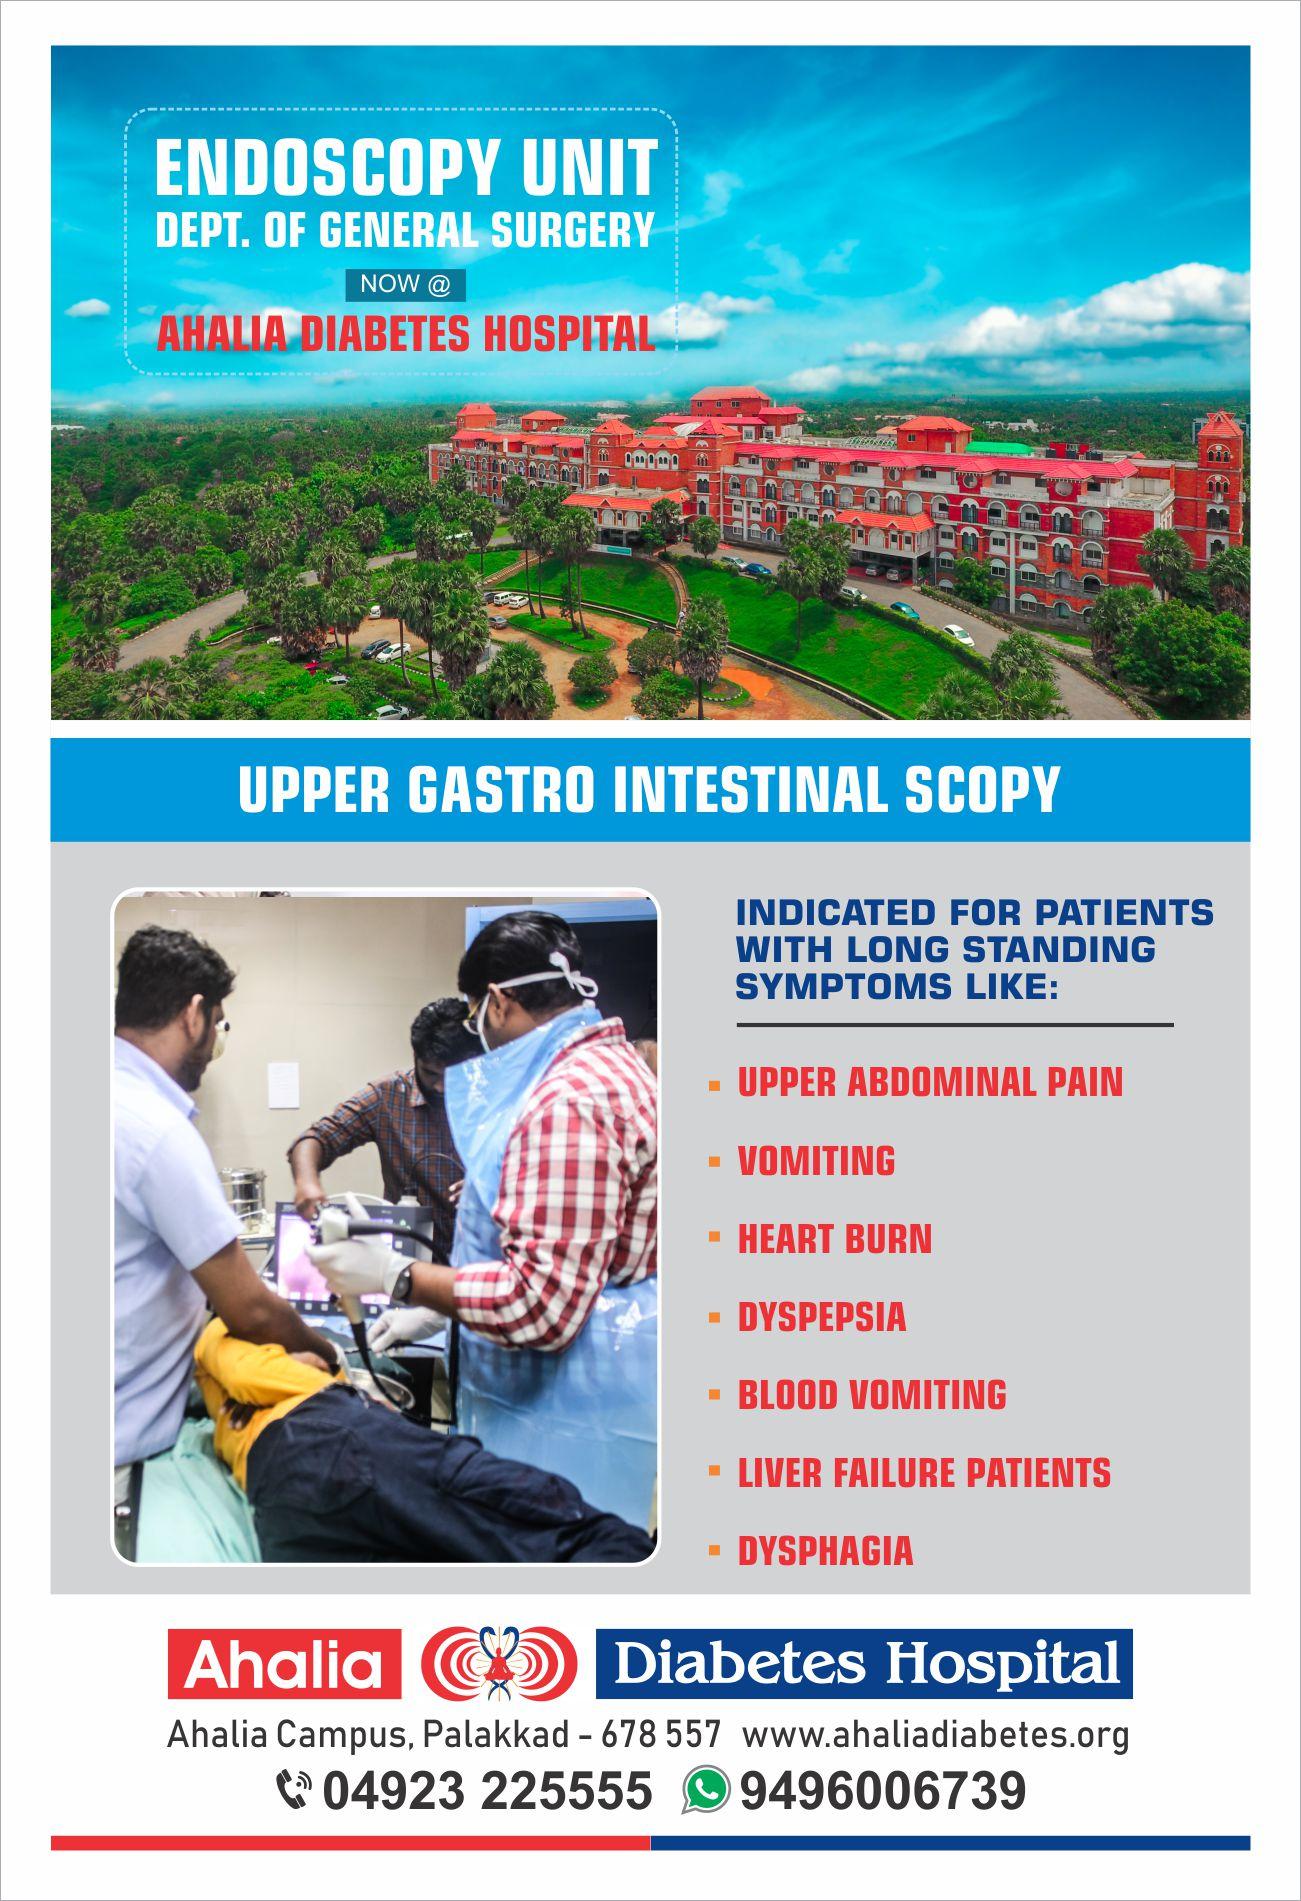 Endoscopy Department: Ahalia Diabetes Hospital